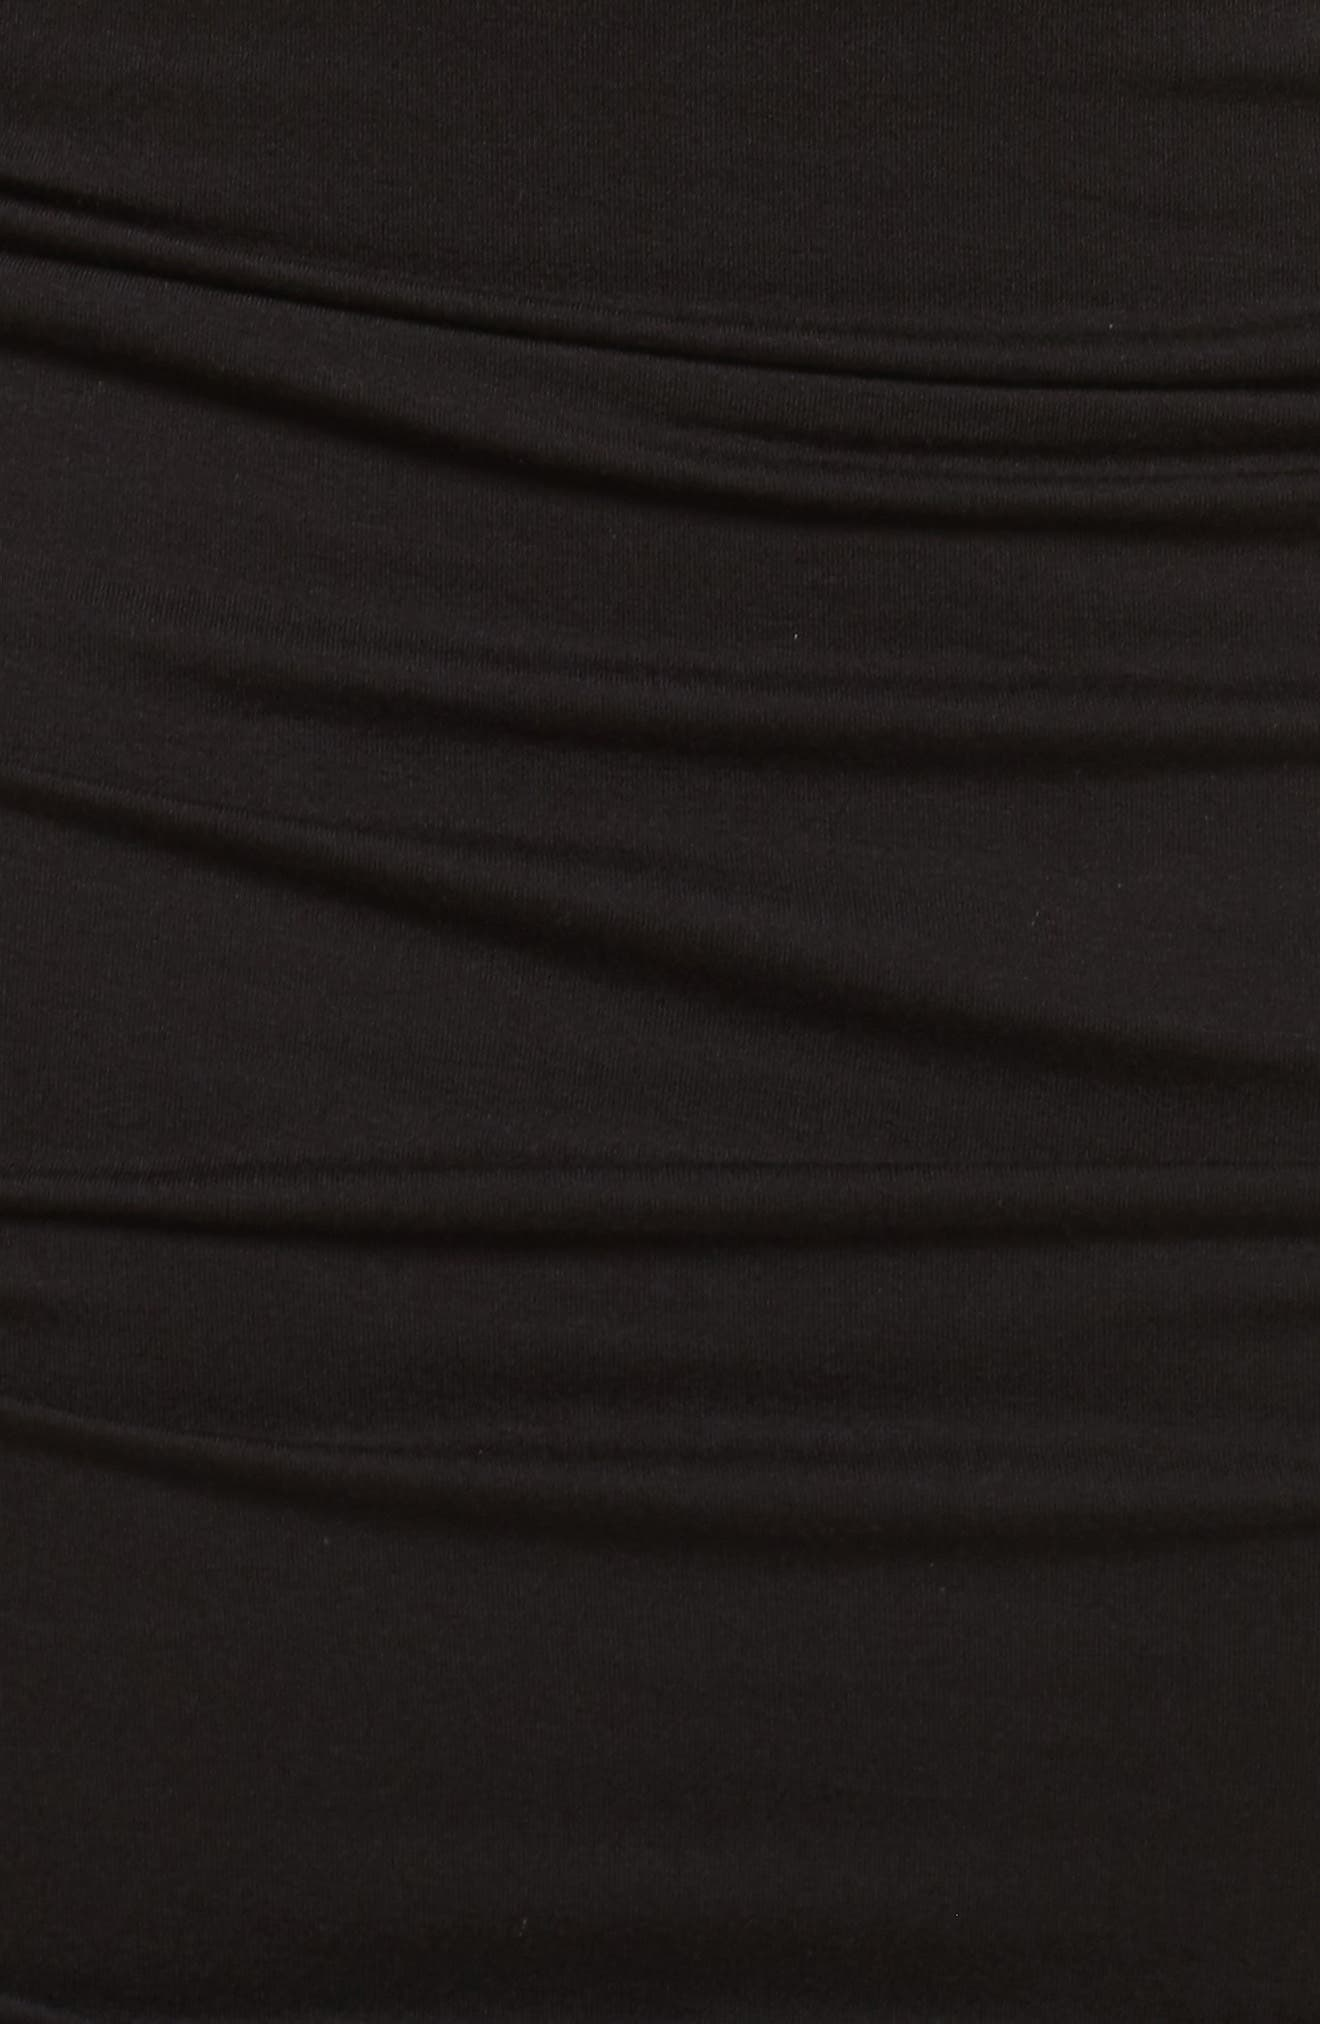 Slit Sleeve Knit Sheath Dress,                             Alternate thumbnail 5, color,                             010